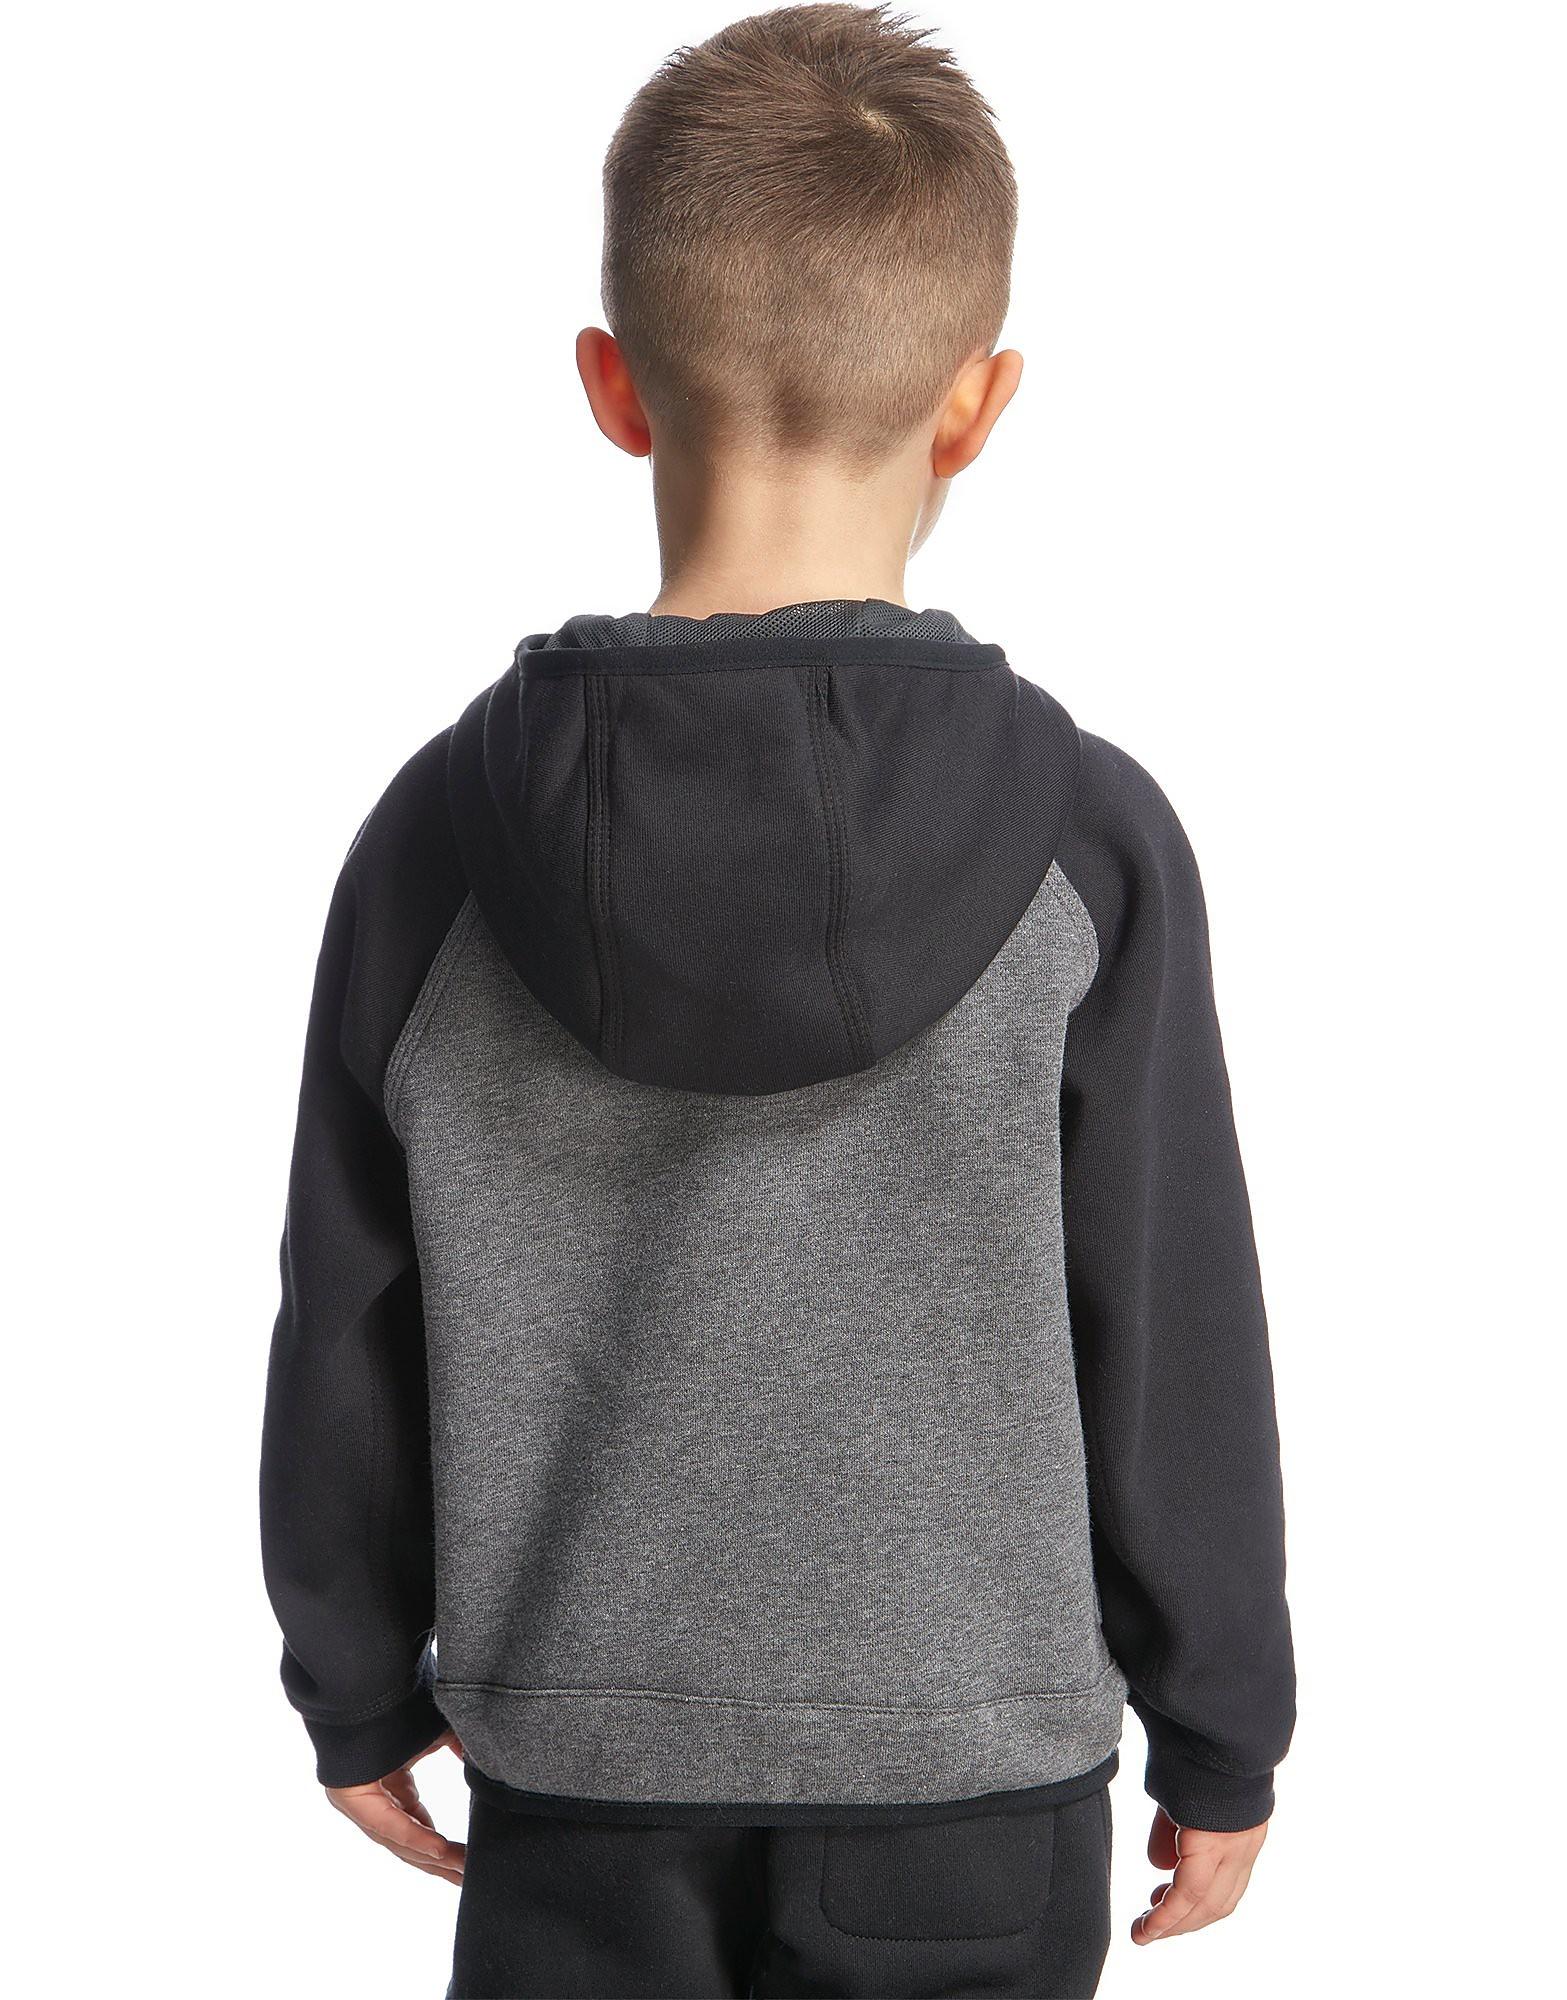 Nike Air Hoody Children